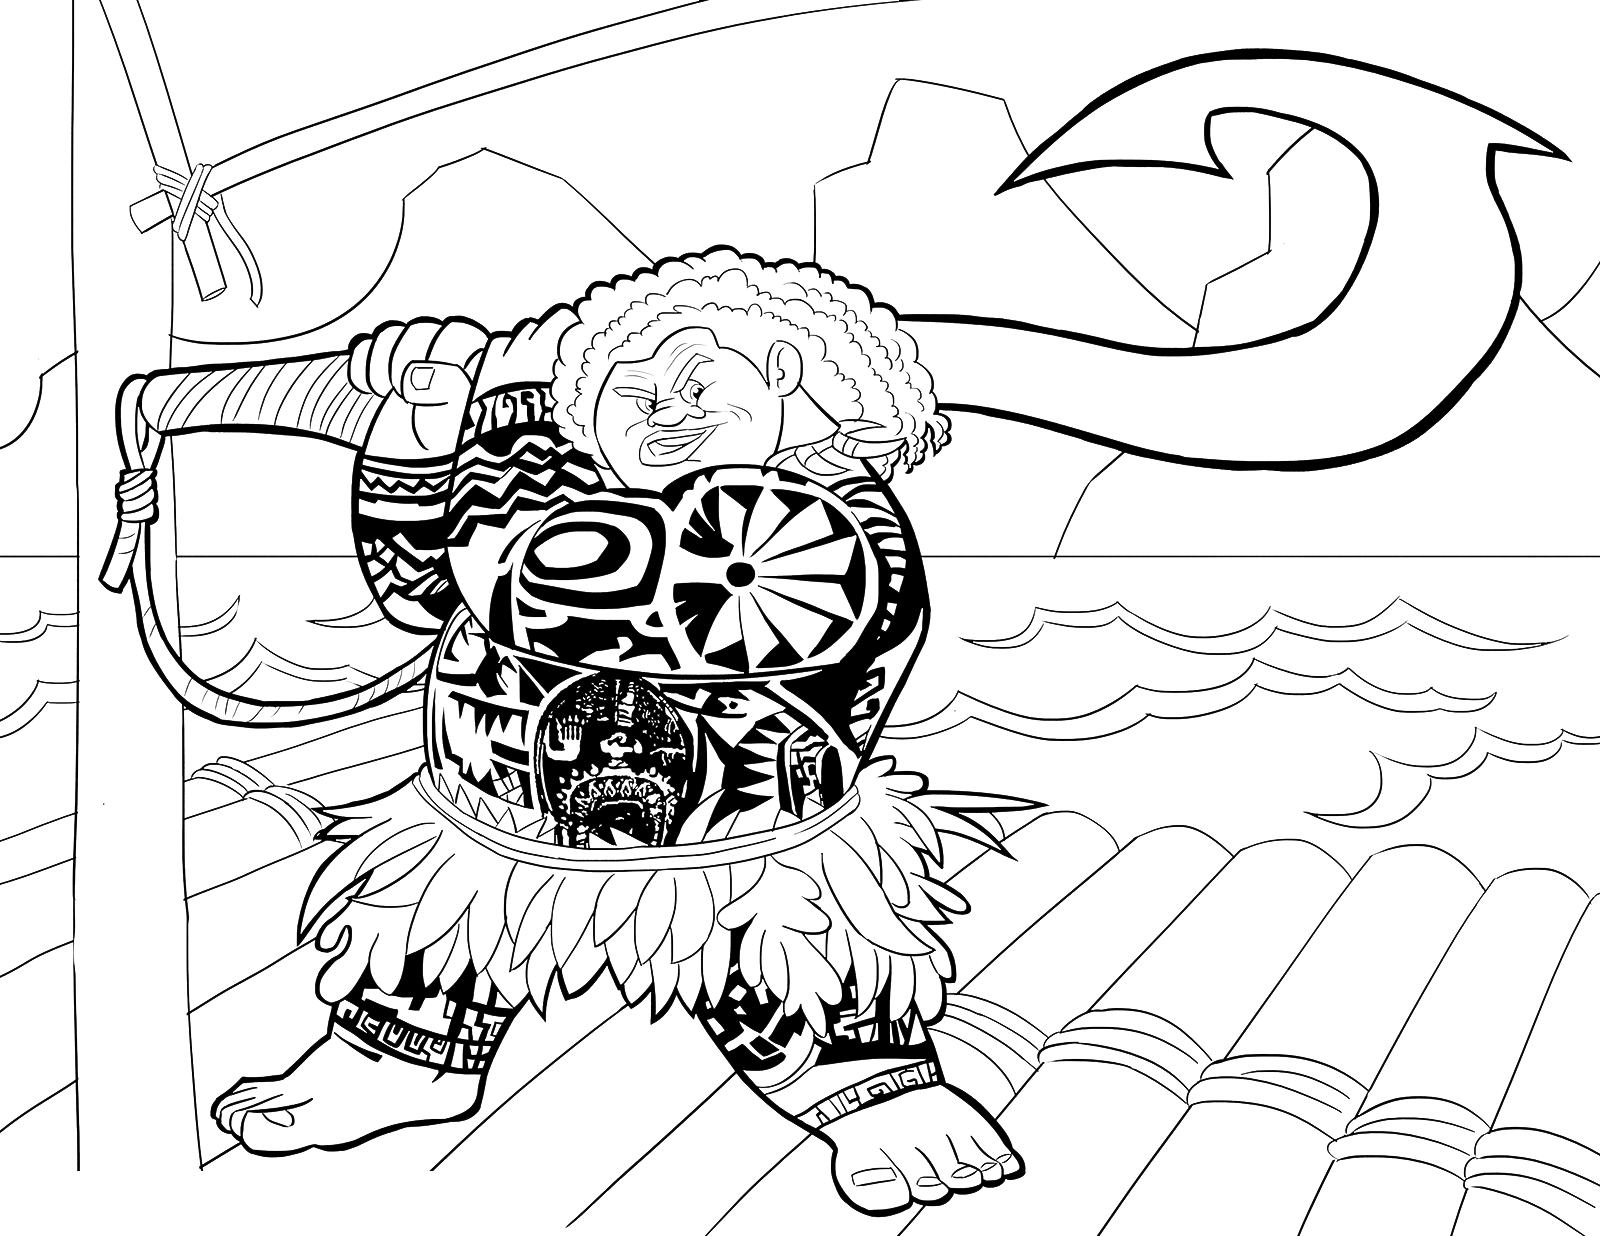 Harpoon coloring #5, Download drawings